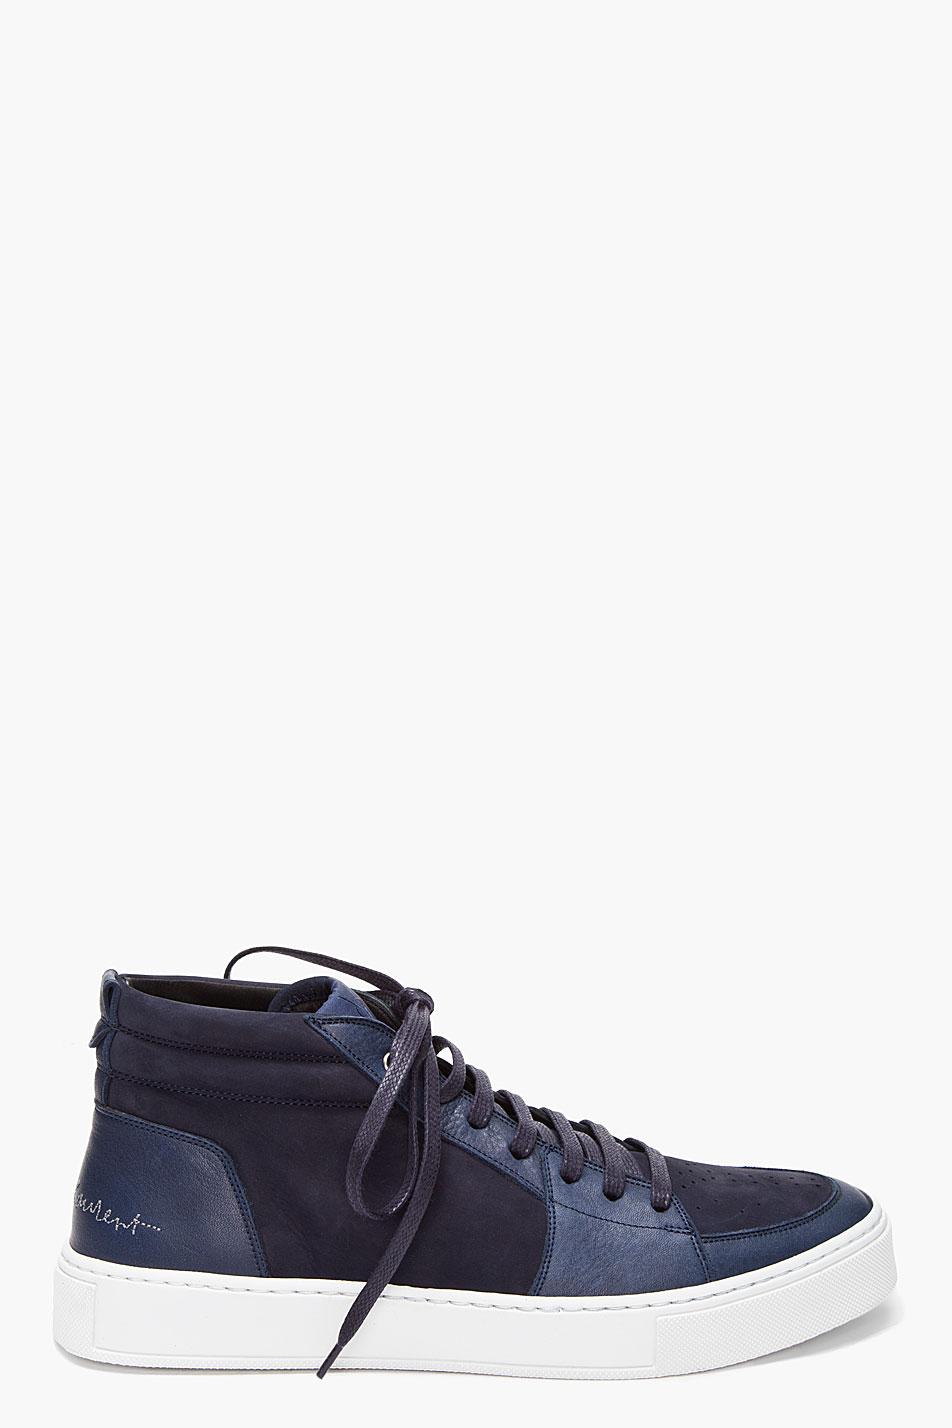 saint laurent navy mid malibu sneakers in blue for men lyst. Black Bedroom Furniture Sets. Home Design Ideas